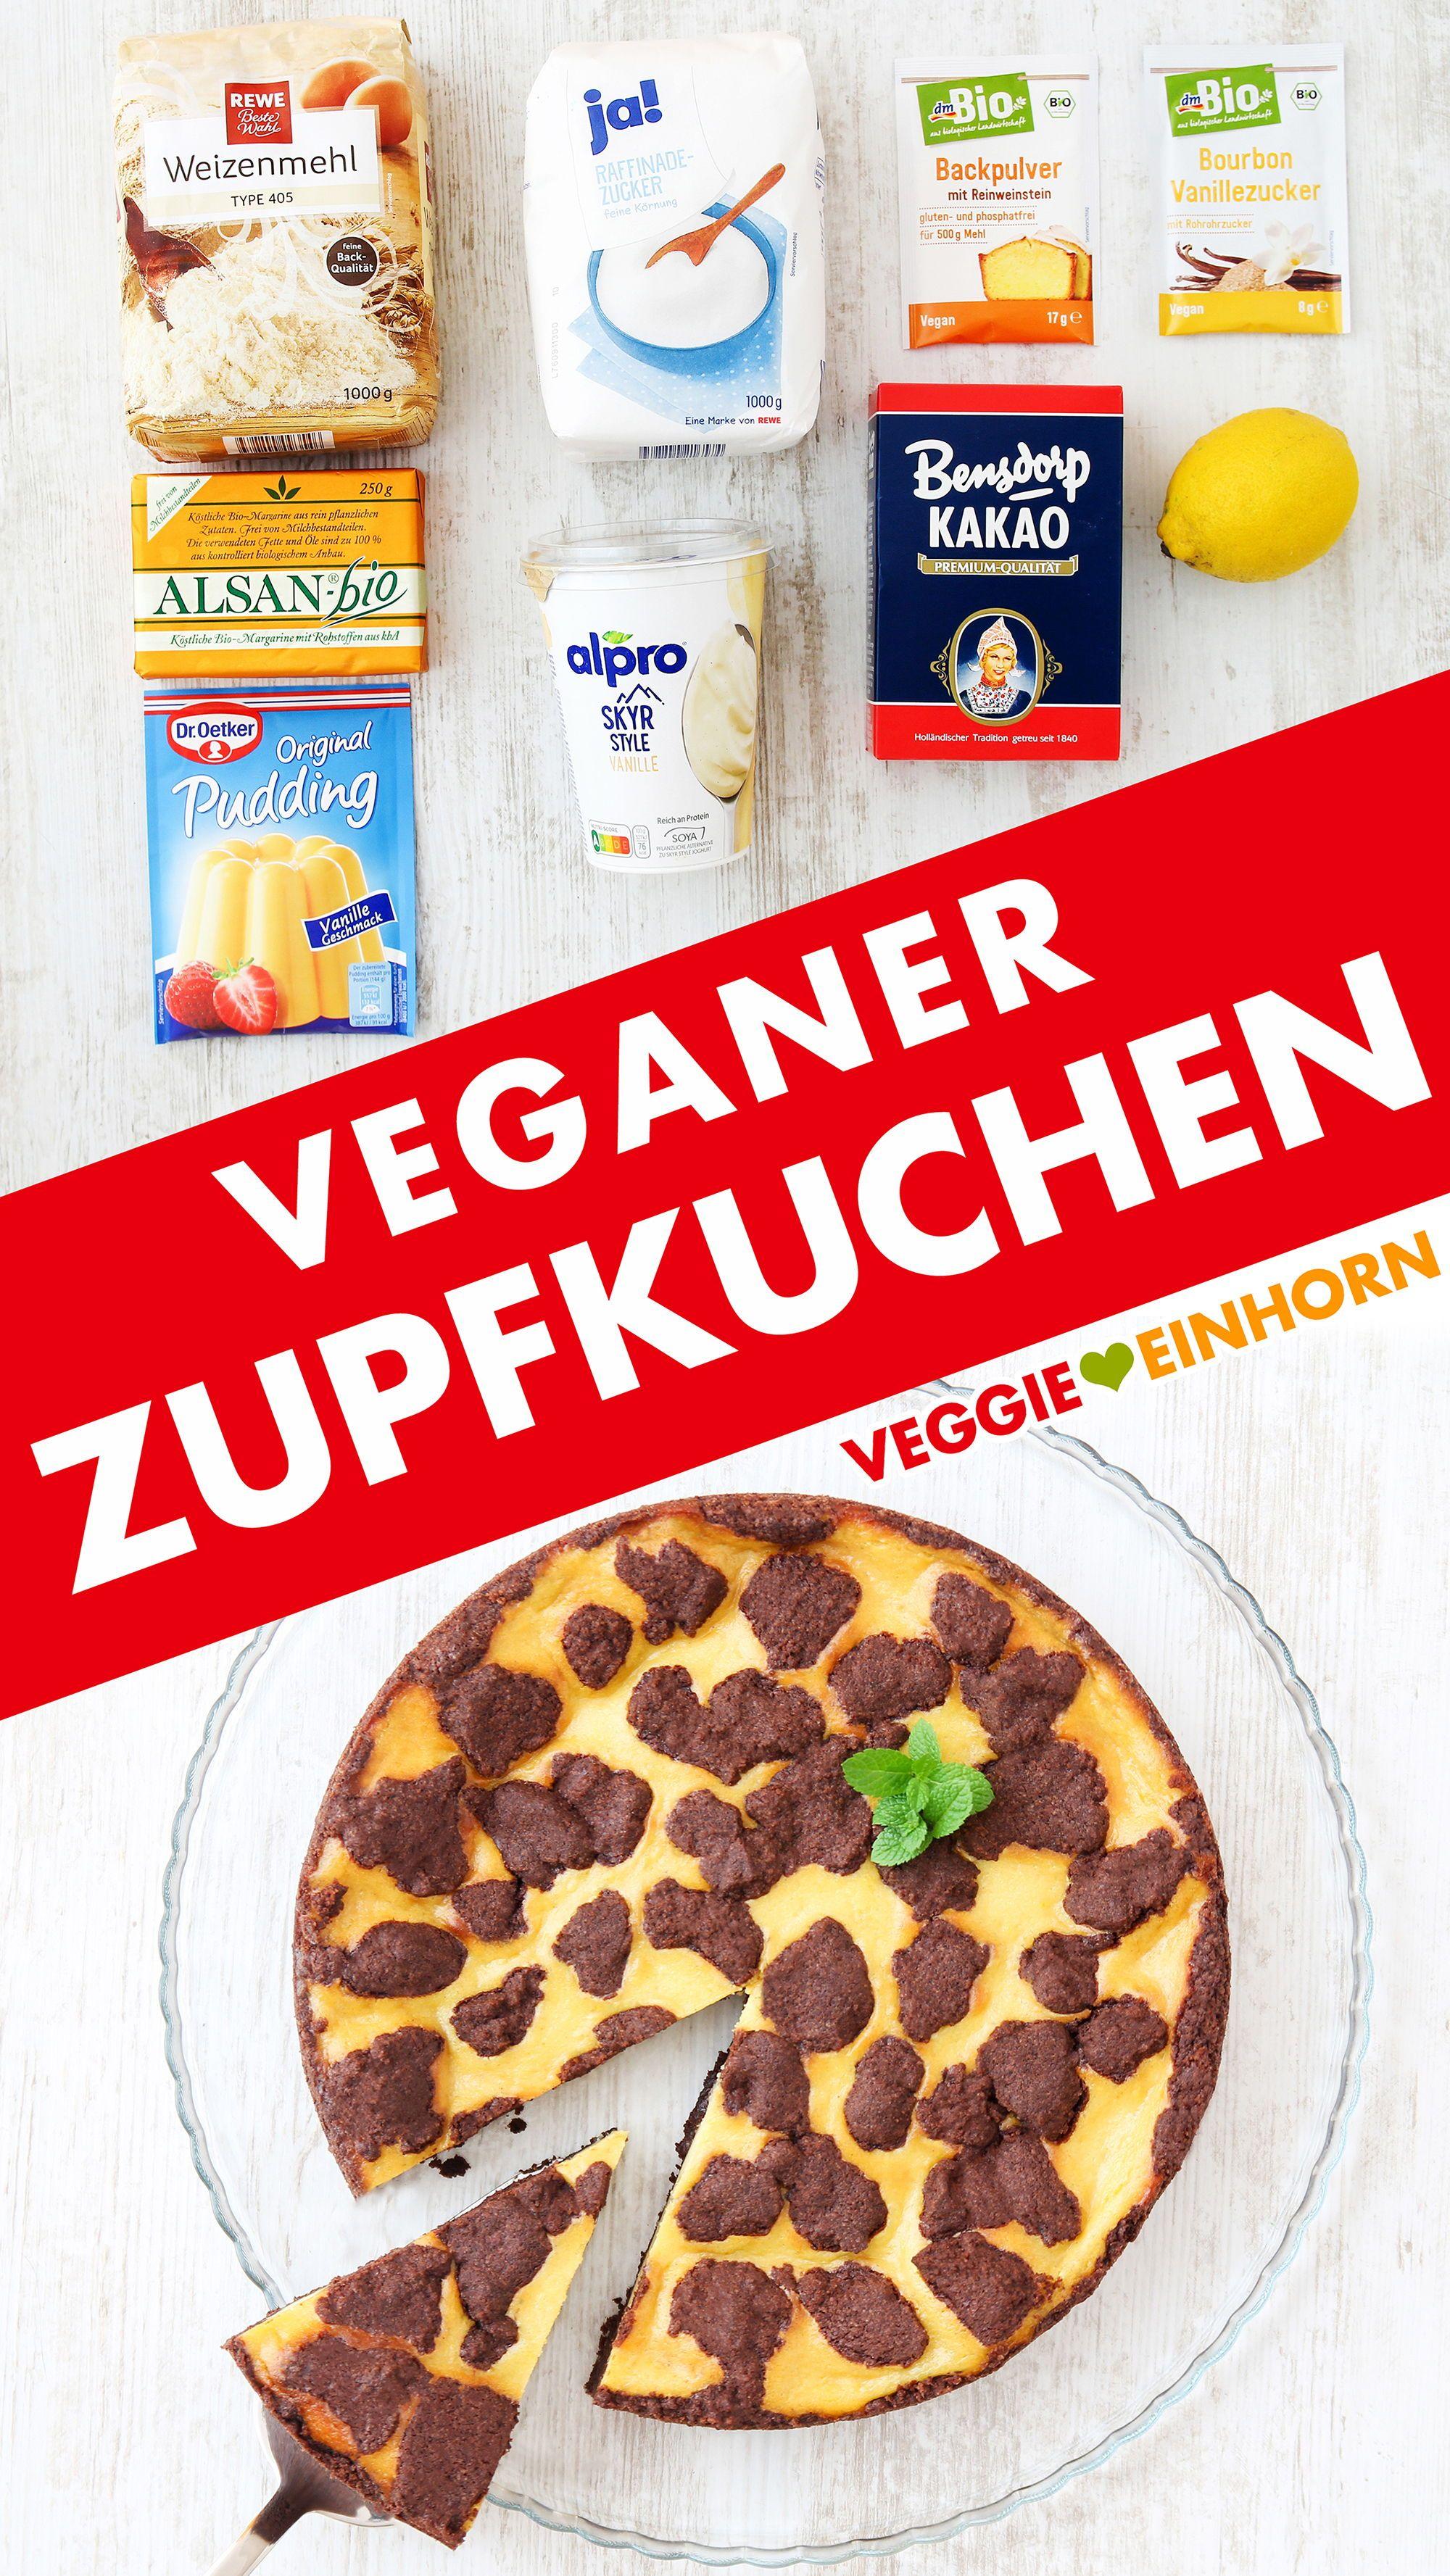 Veganer Russischer Zupfkuchen Rezept Veganer Kuchen Zupfkuchen Rezept Kuchen Backen Ohne Ei